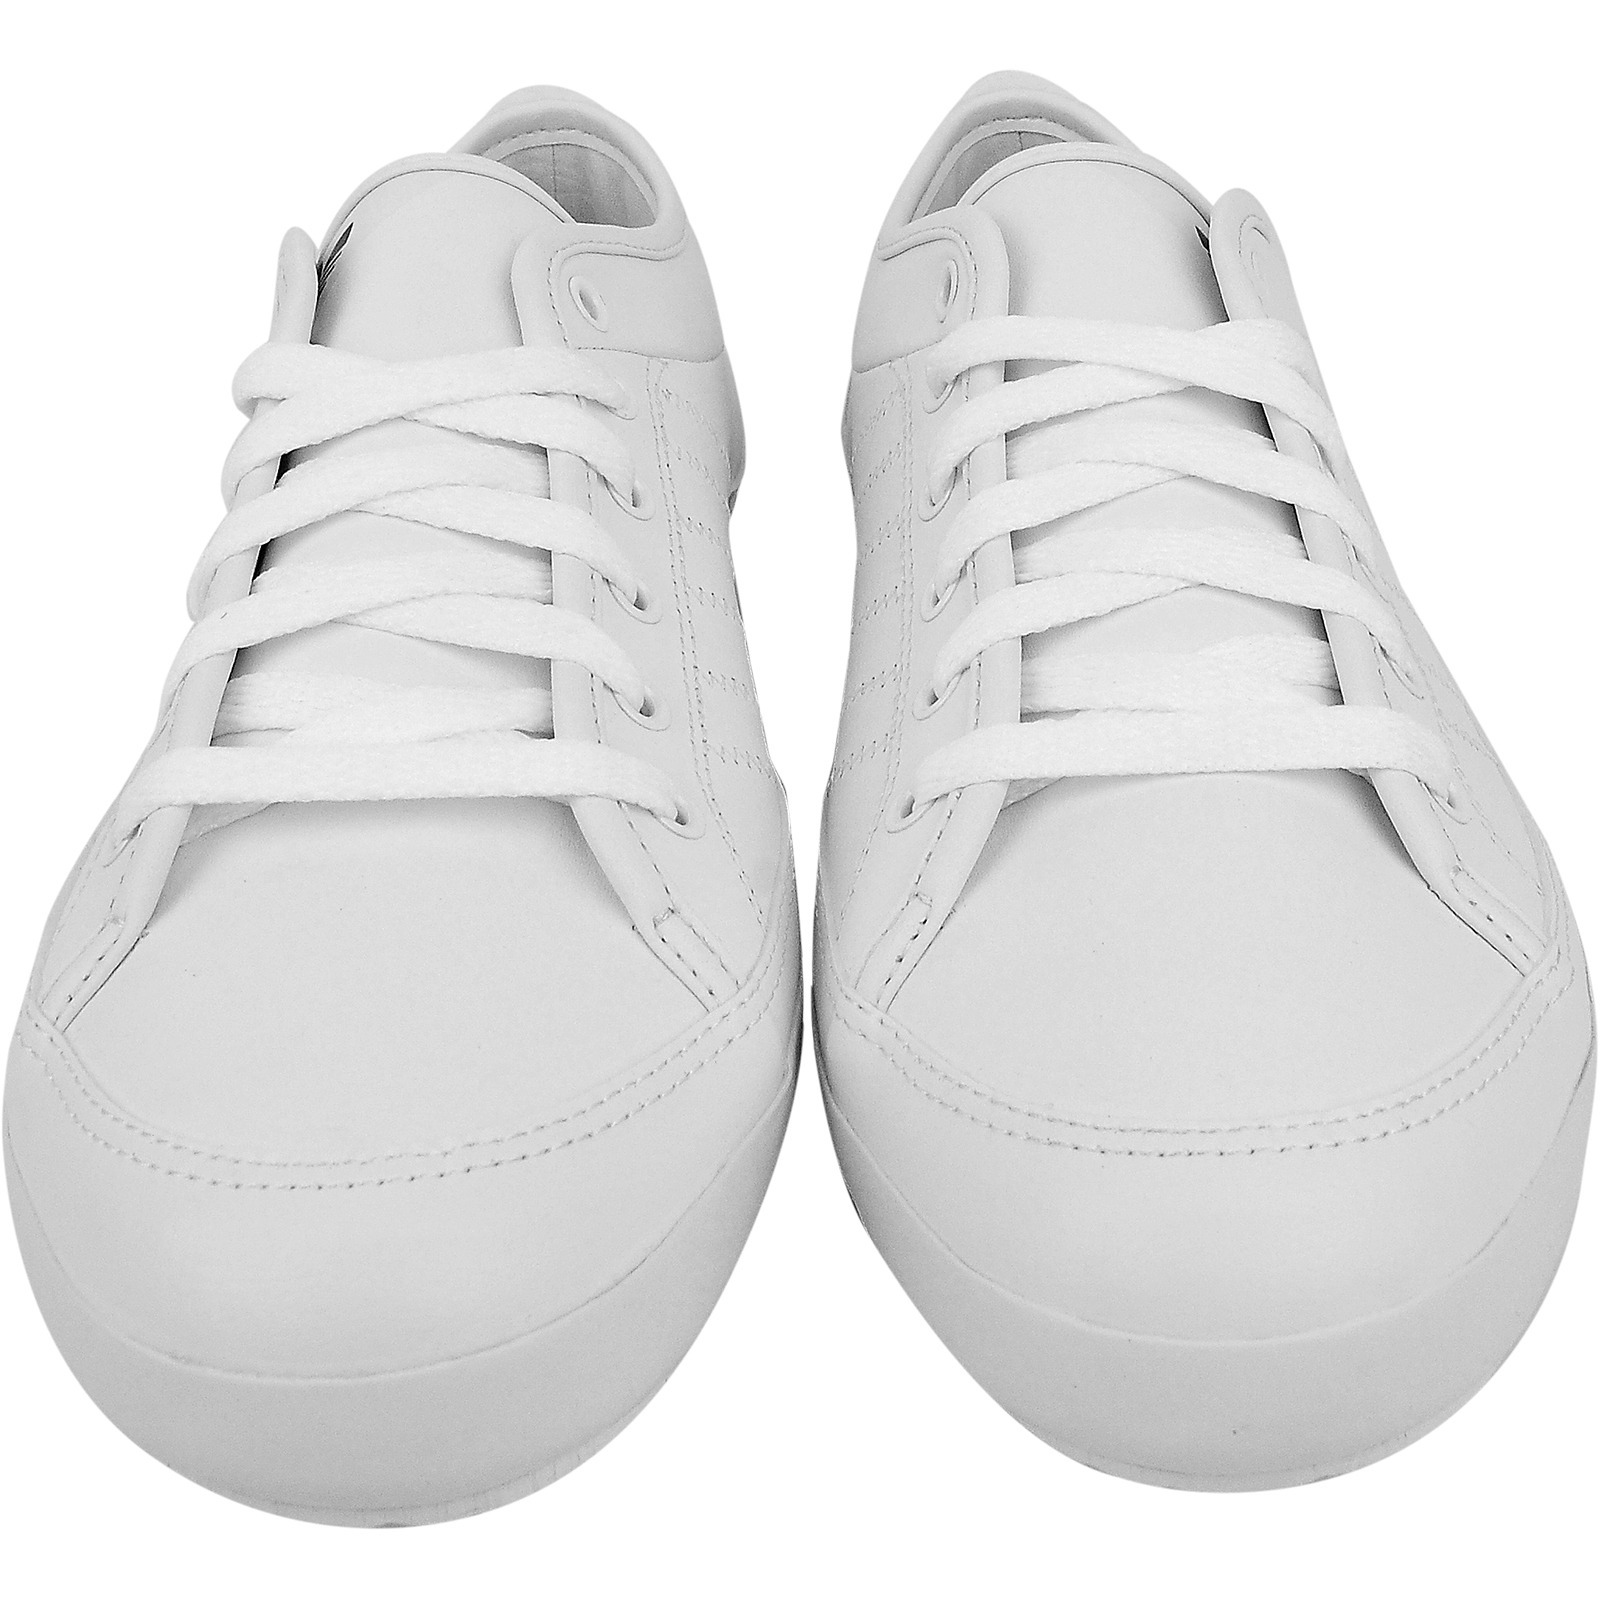 Pantofi sport barbati adidas Nizza Lo Remo G51856